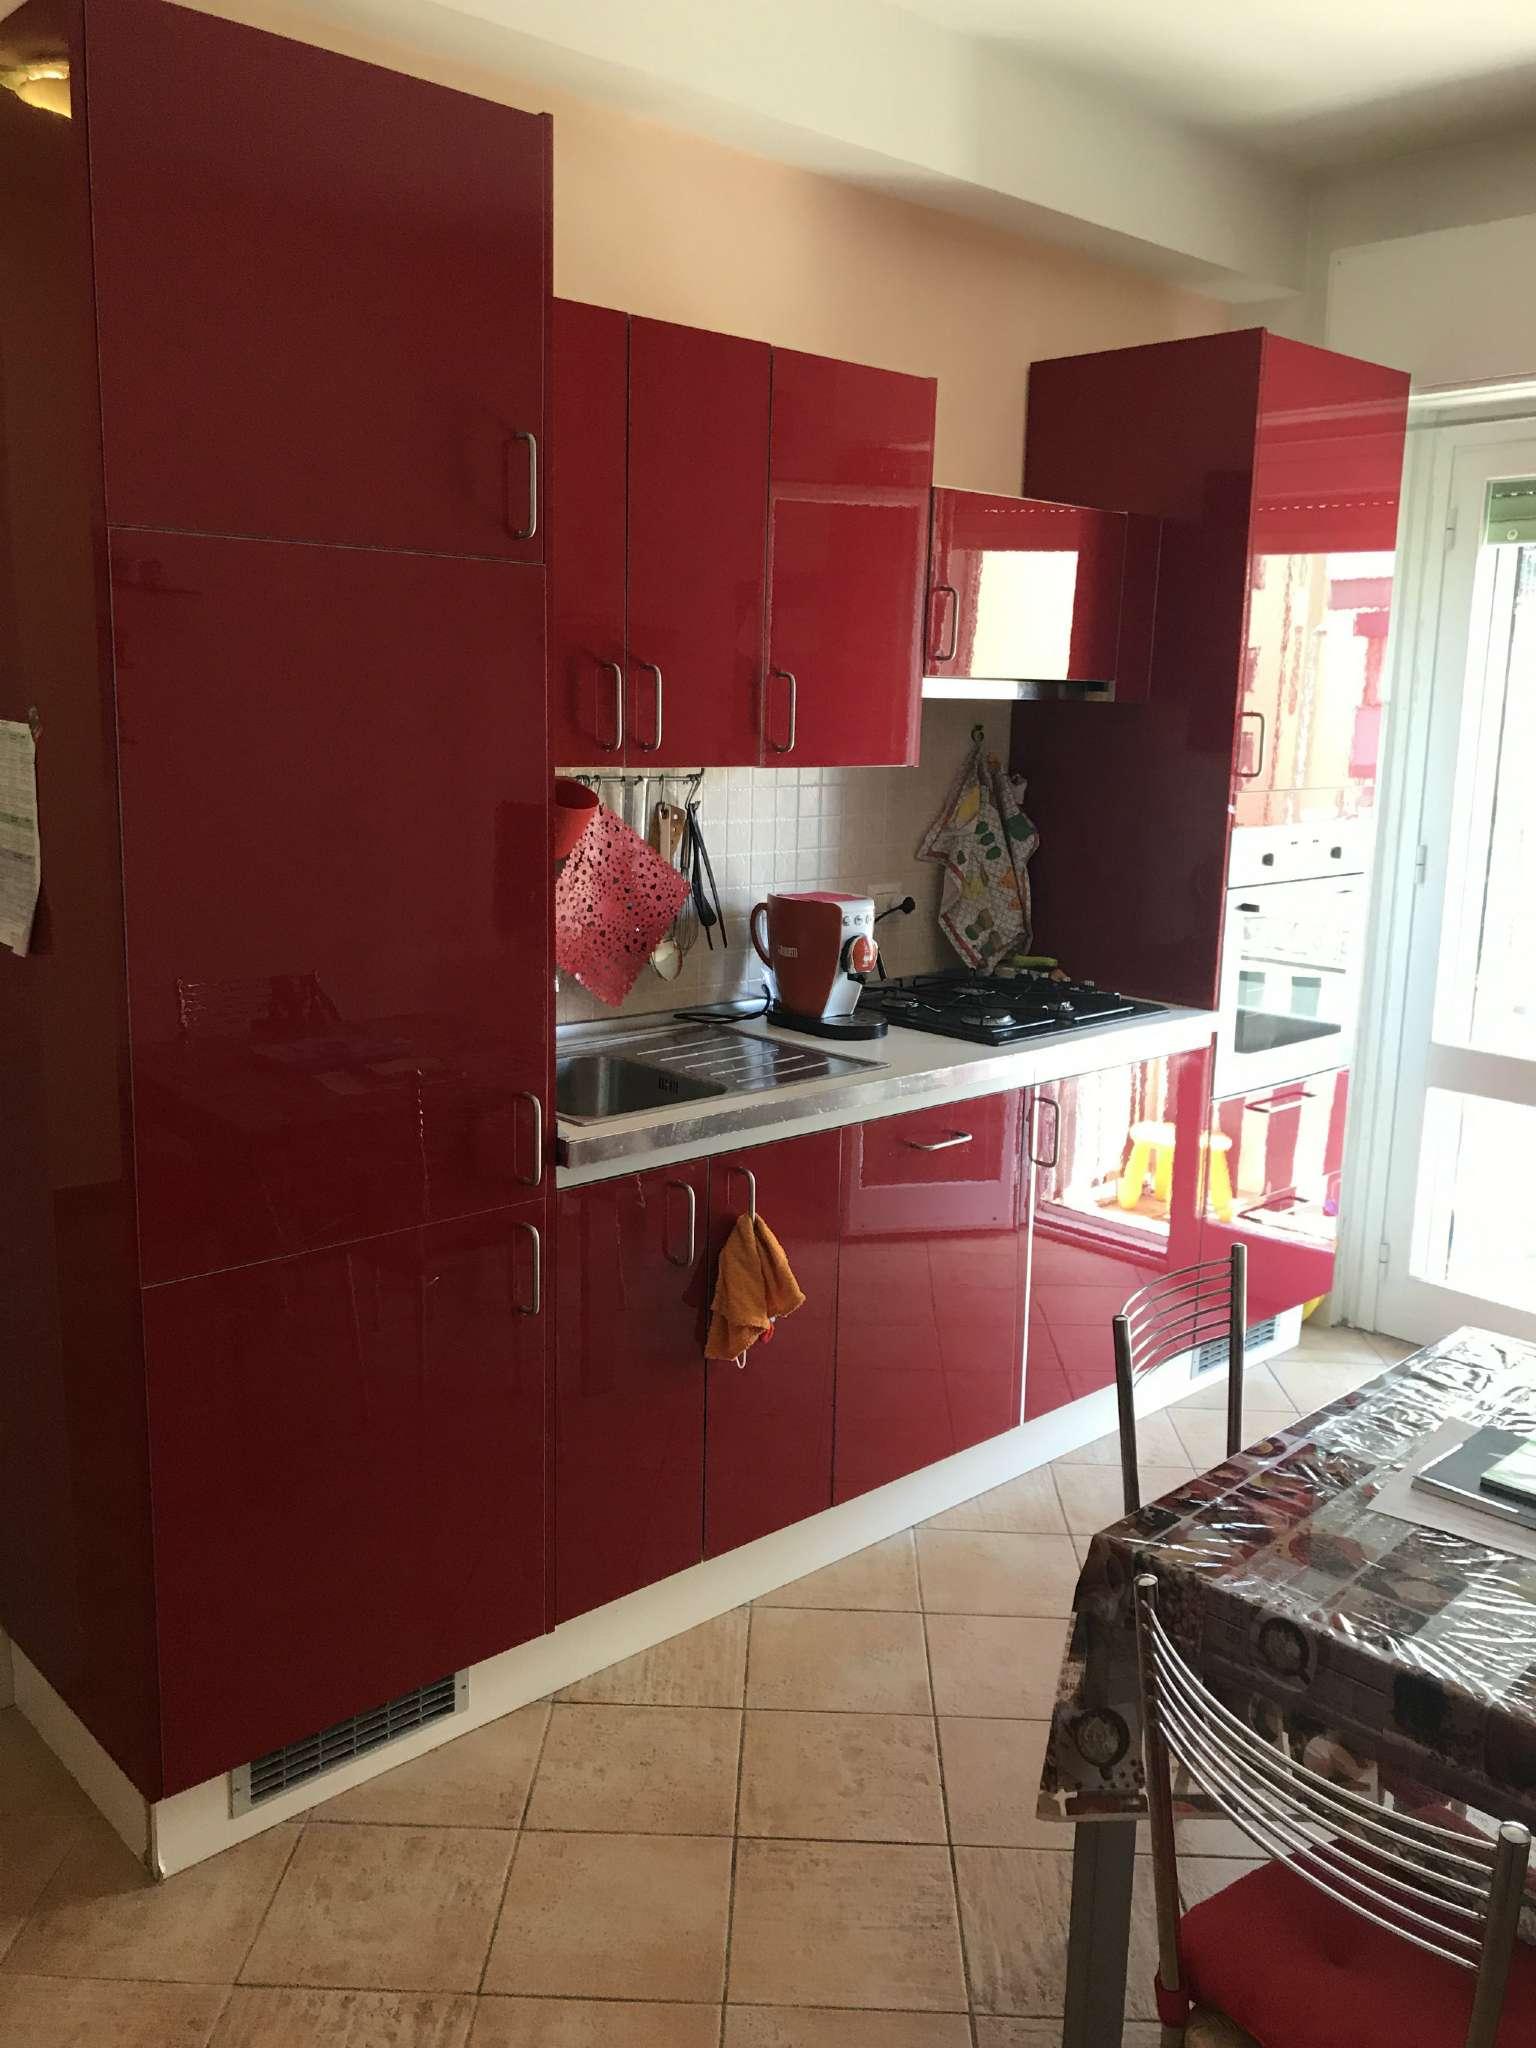 Appartamento in Vendita a Firenze Periferia Nord:  3 locali, 60 mq  - Foto 1